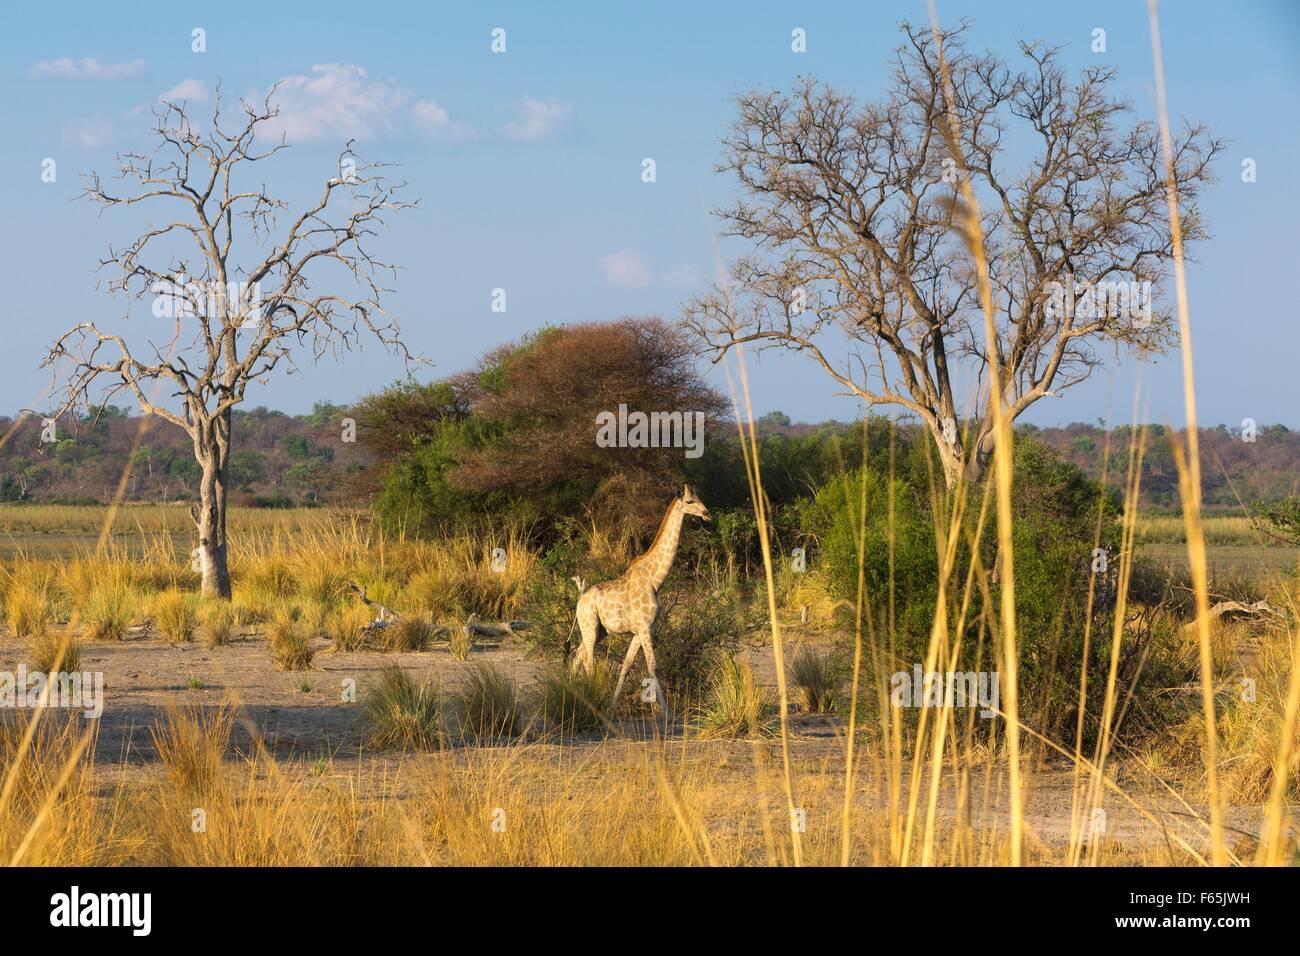 A giraffe on the flood plain of the Kwando River, Mahango National Park, West-Caprivi, Namibia - Stock Image